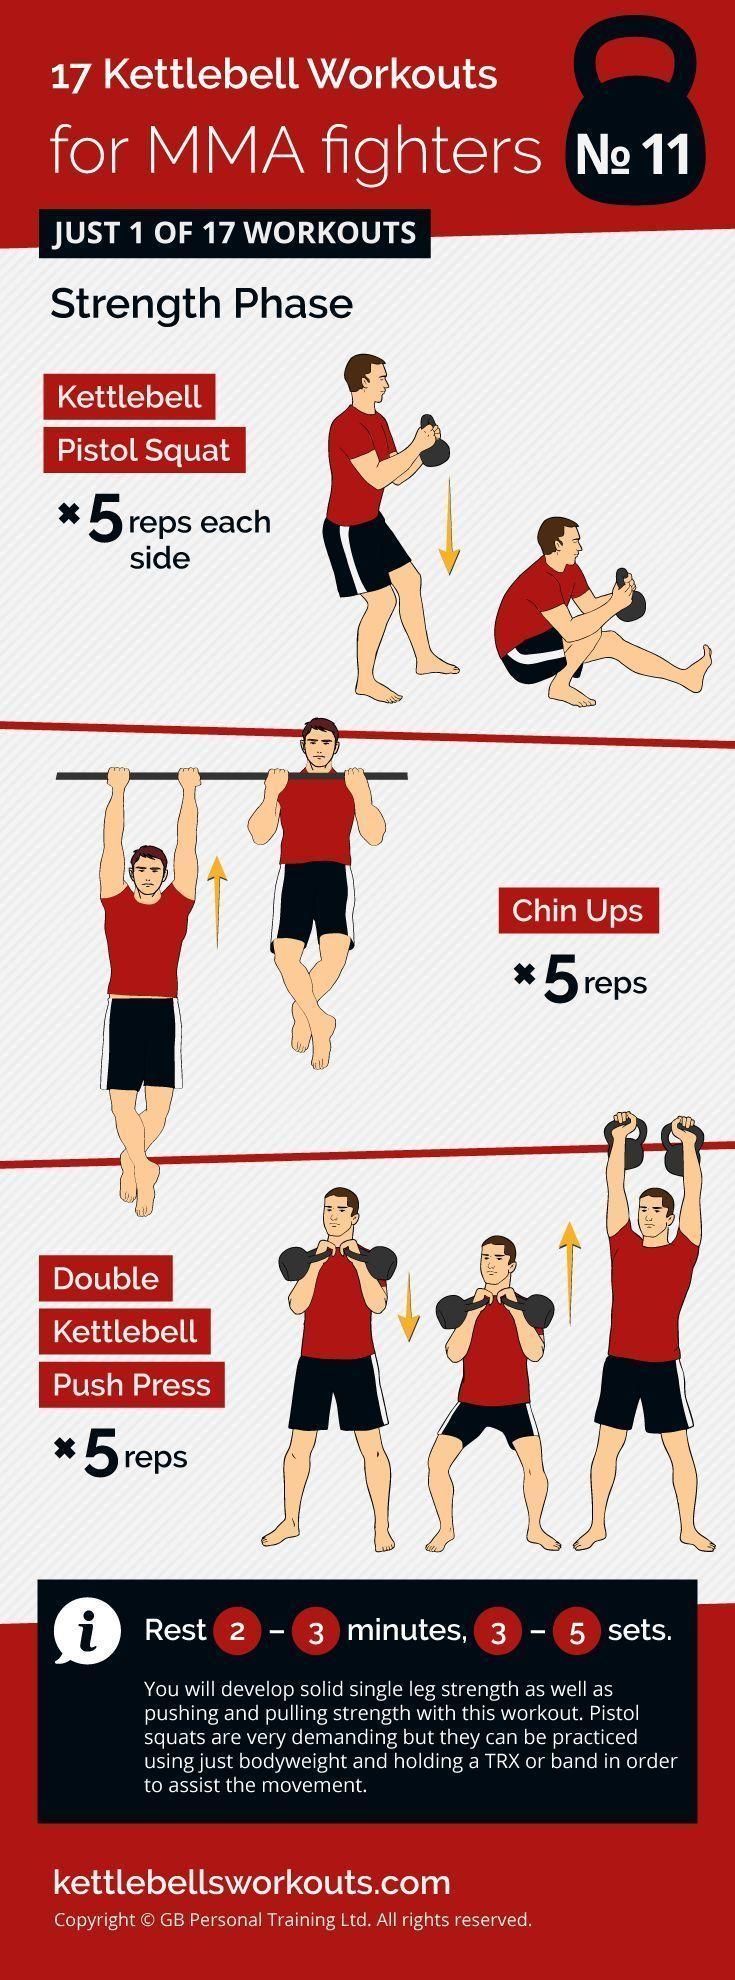 #fitness #kettlebell #kettlebell trainingsplan muskelaufbau #langhantel #Men #muskelaufbau #started...